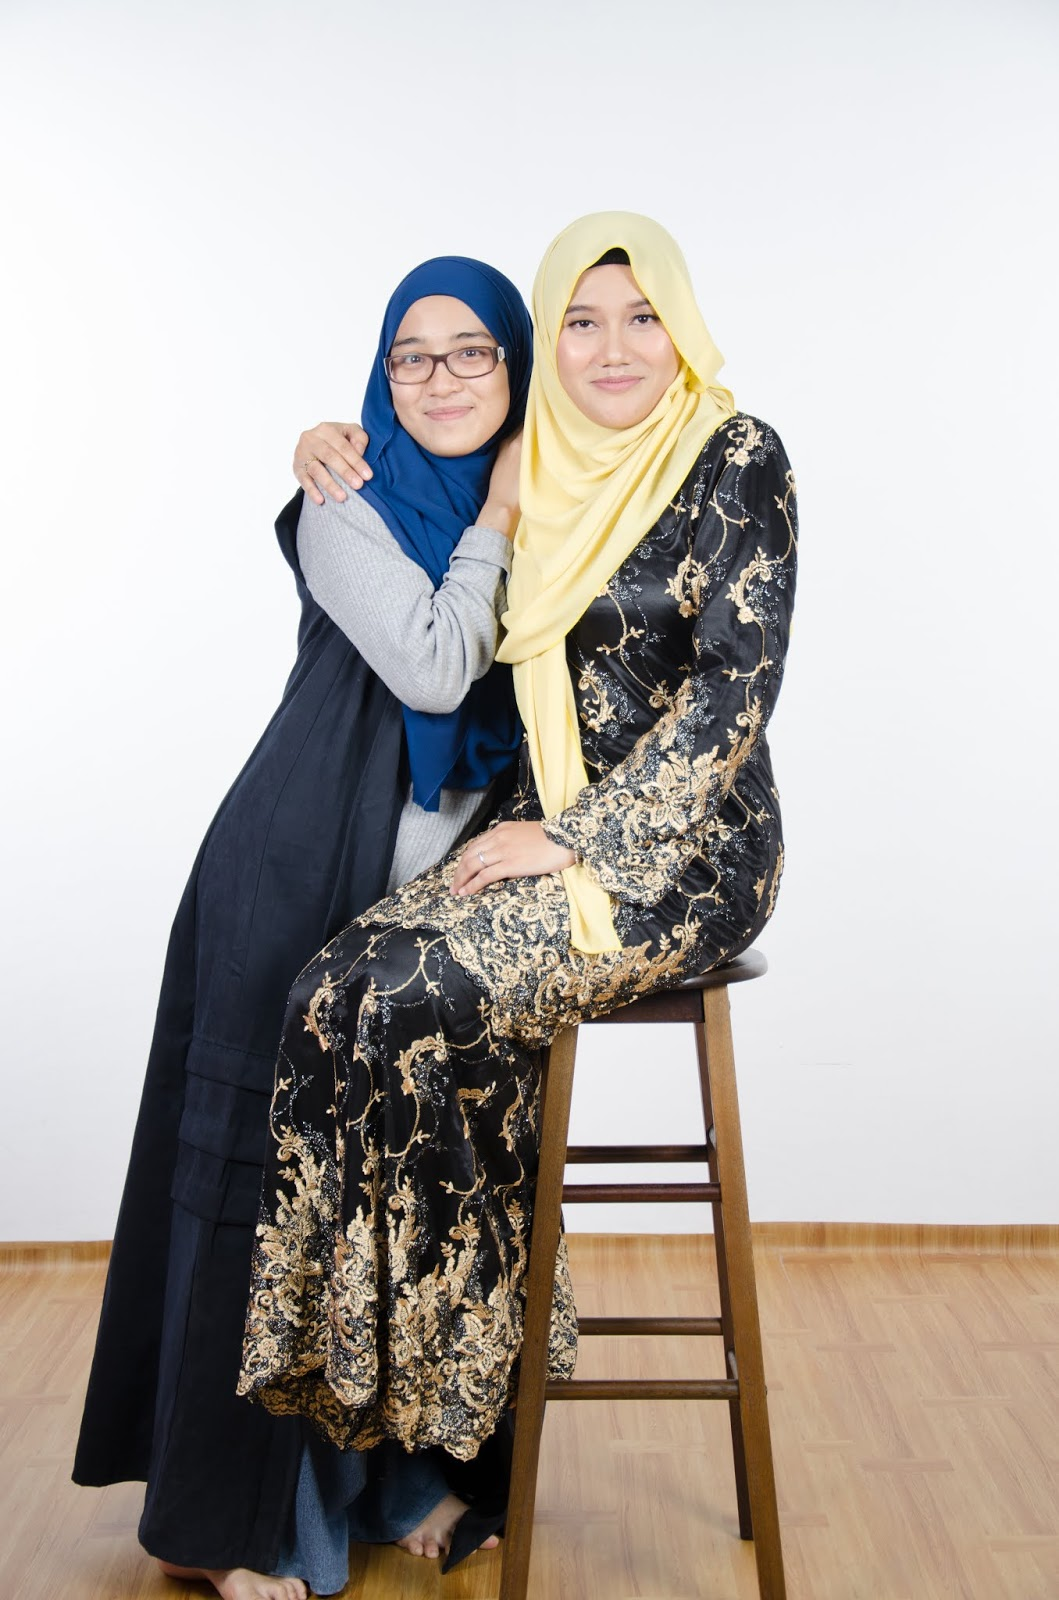 Puas hati dengan MUA di Kuala Terengganu dengan harga berbaloi